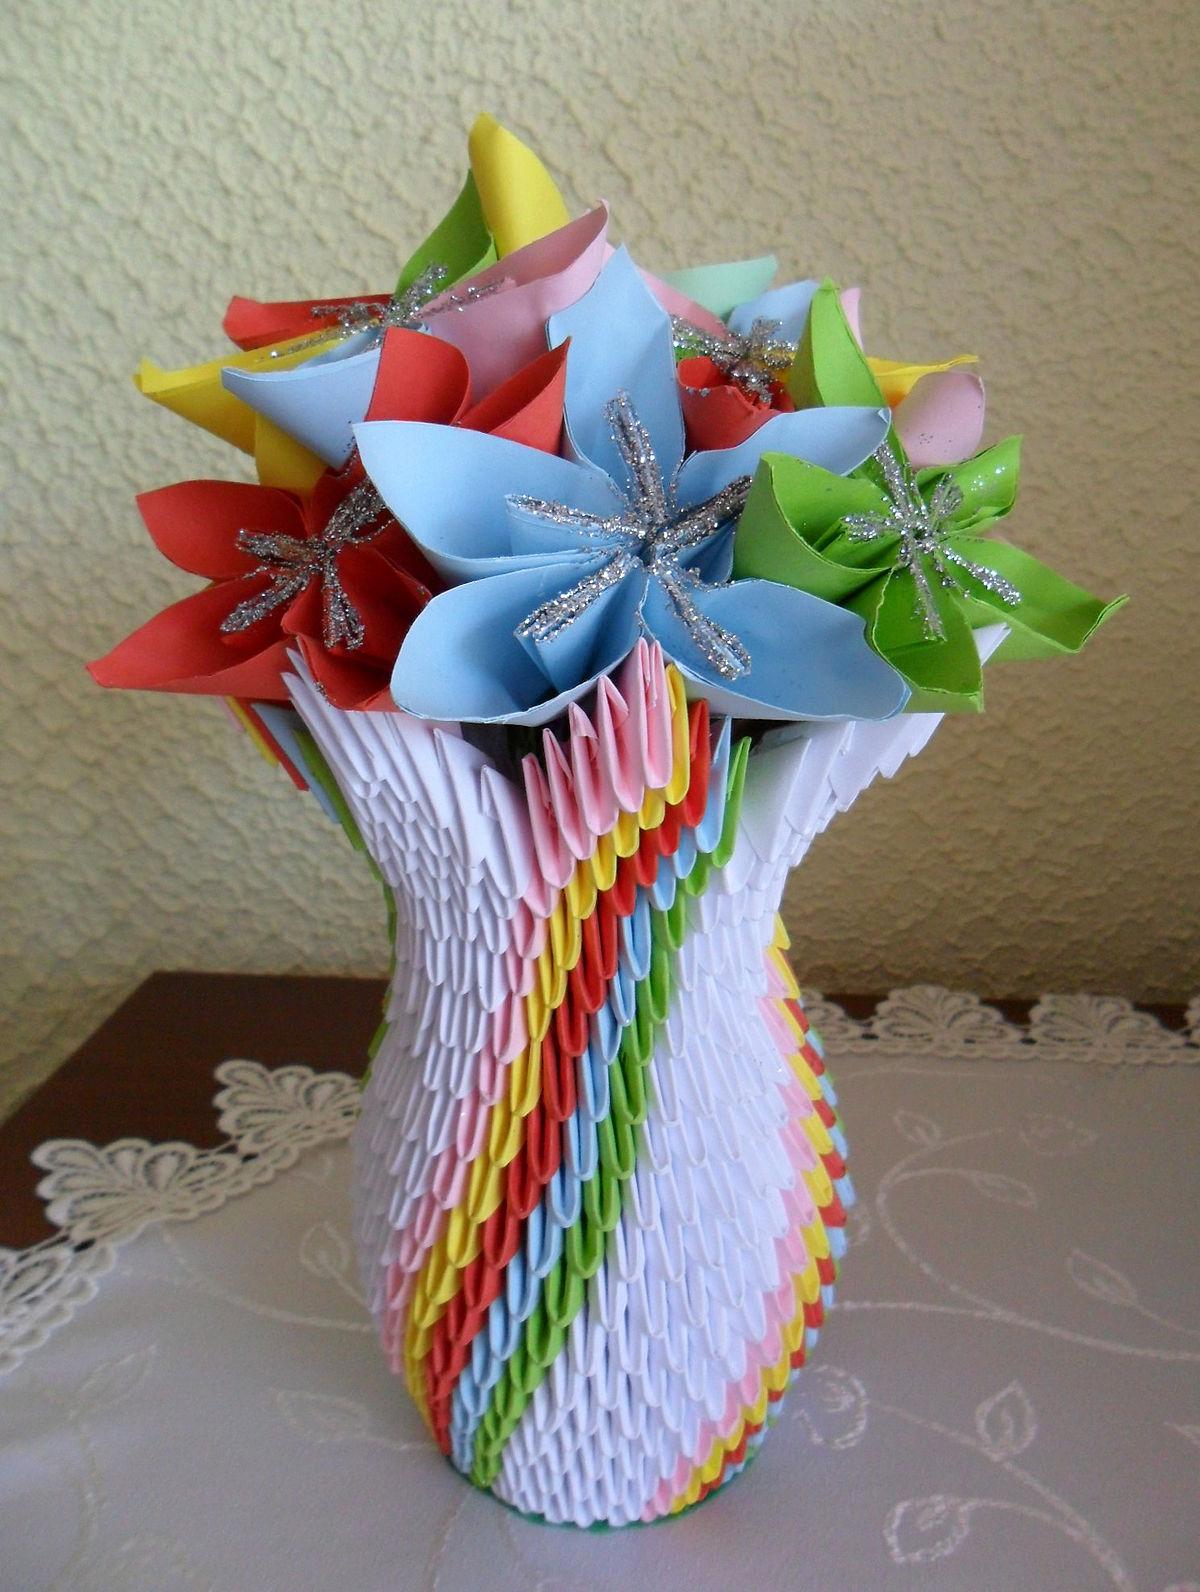 Origami modulaire — Wikipédia